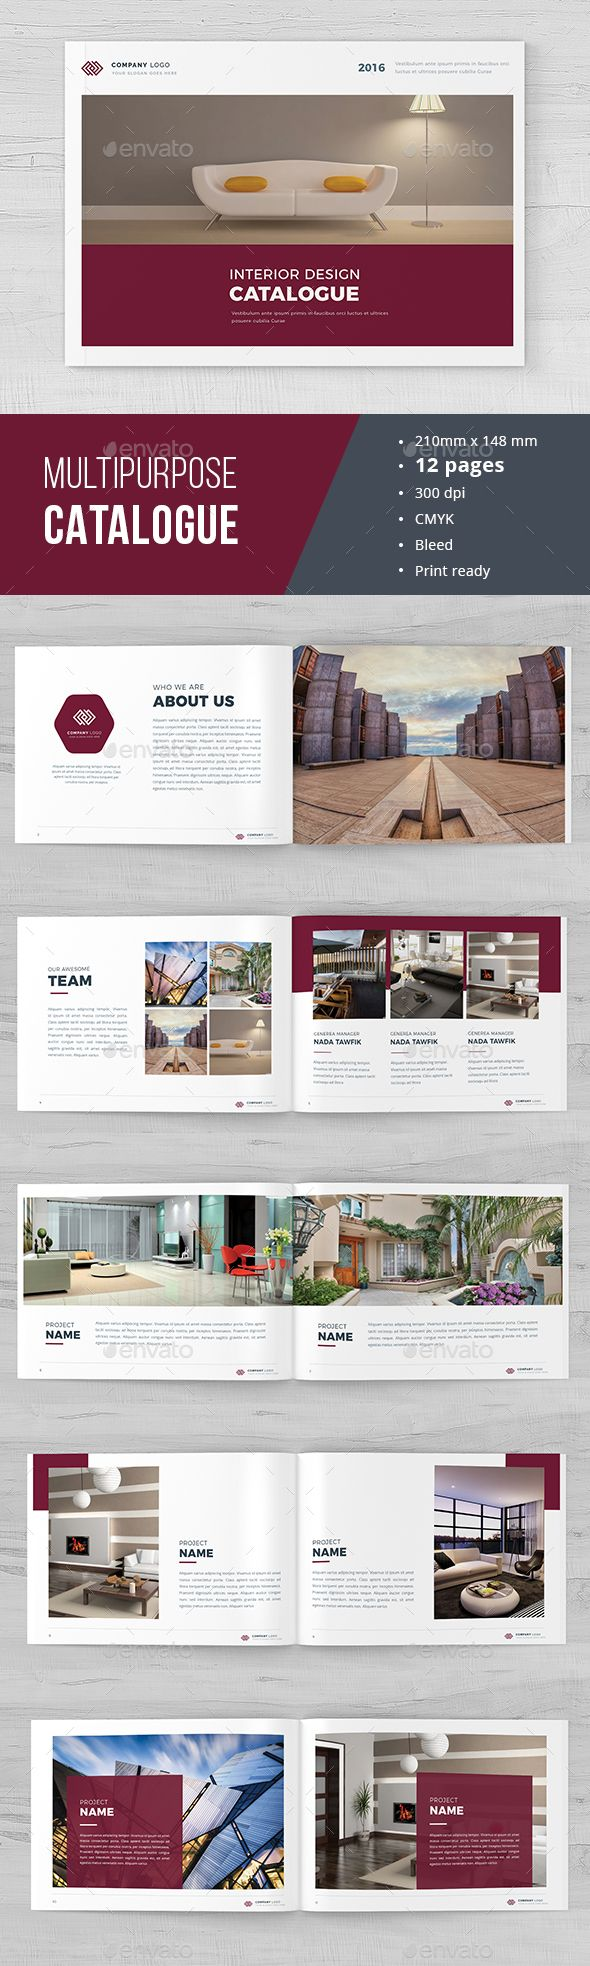 Modern Indesign Catalogue 02 | Revistas